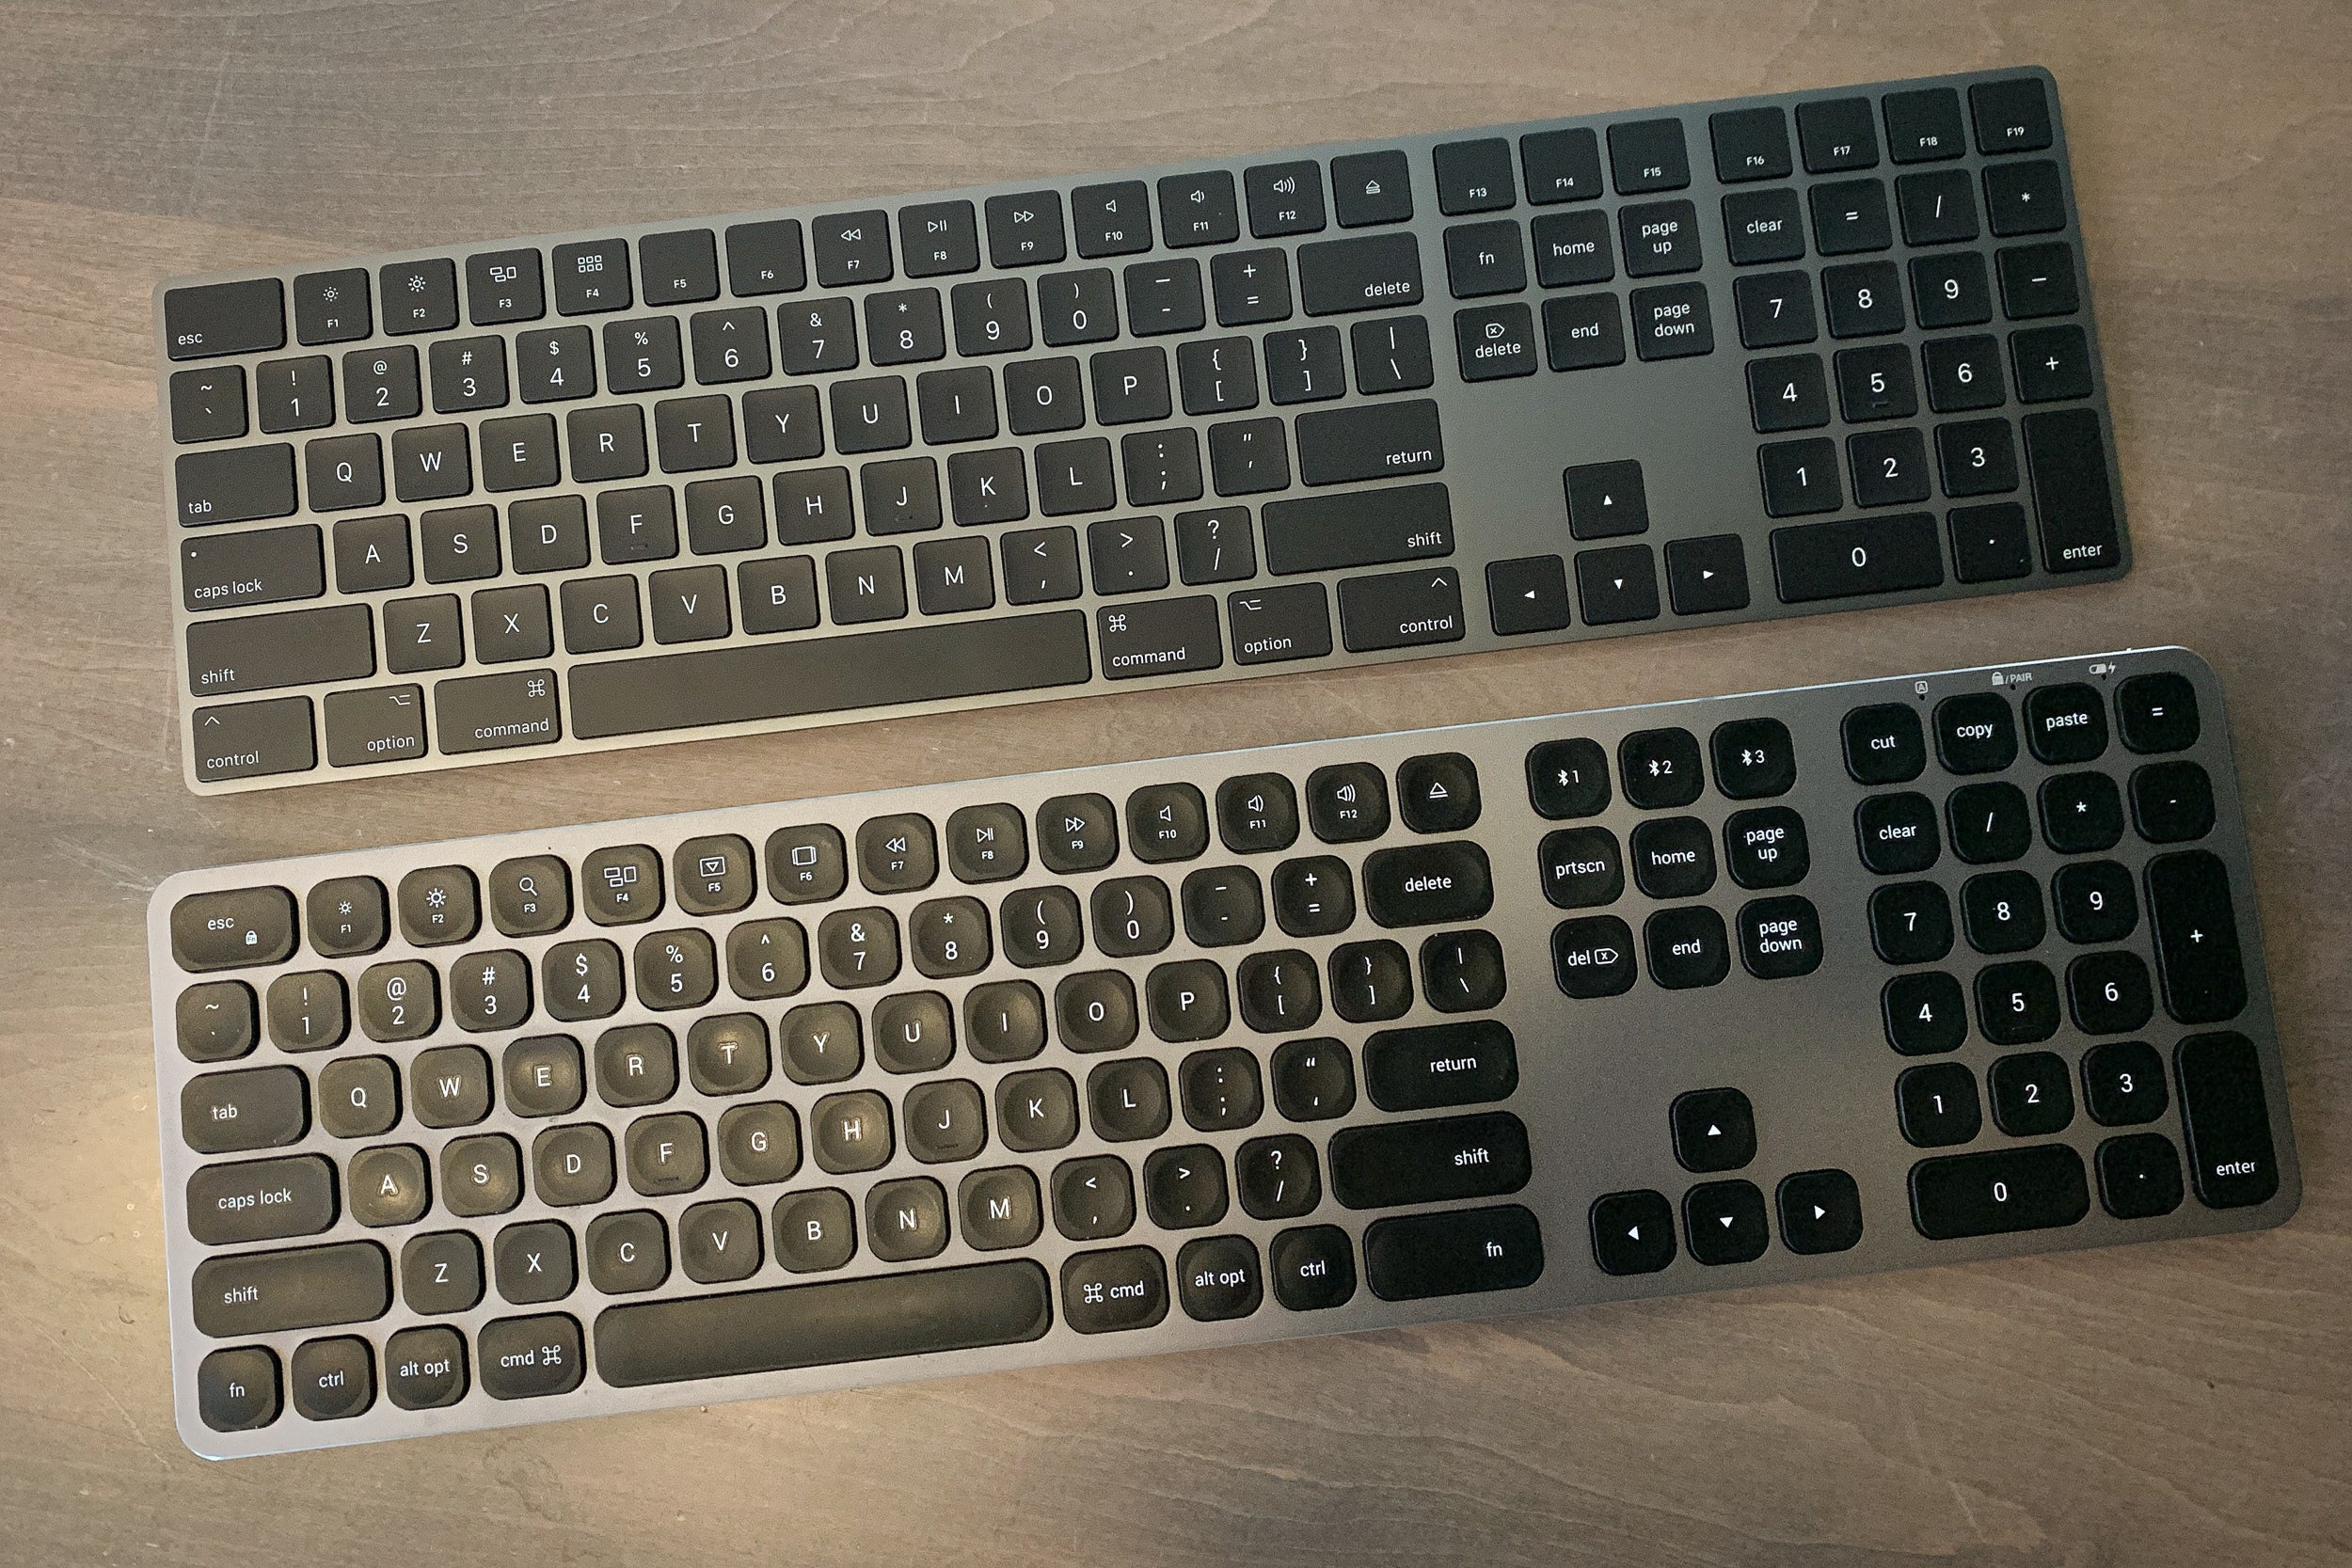 satechi aluminum bluetooth keyboard with numeric keypad review macworld. Black Bedroom Furniture Sets. Home Design Ideas